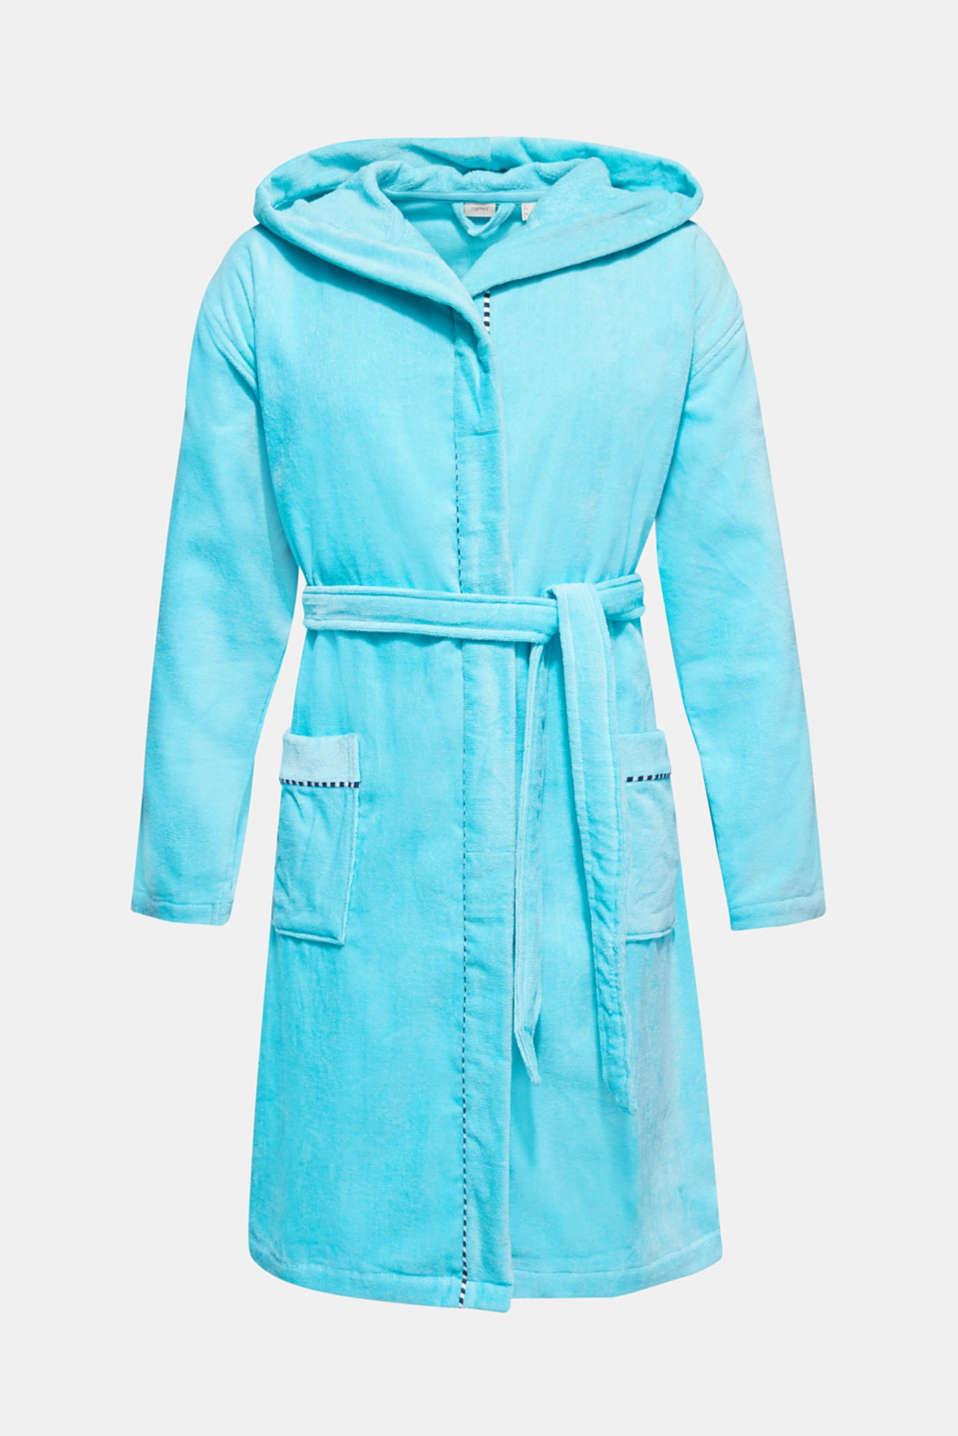 Unisex bathrobe made of 100% cotton, TURQUOISE, detail image number 4